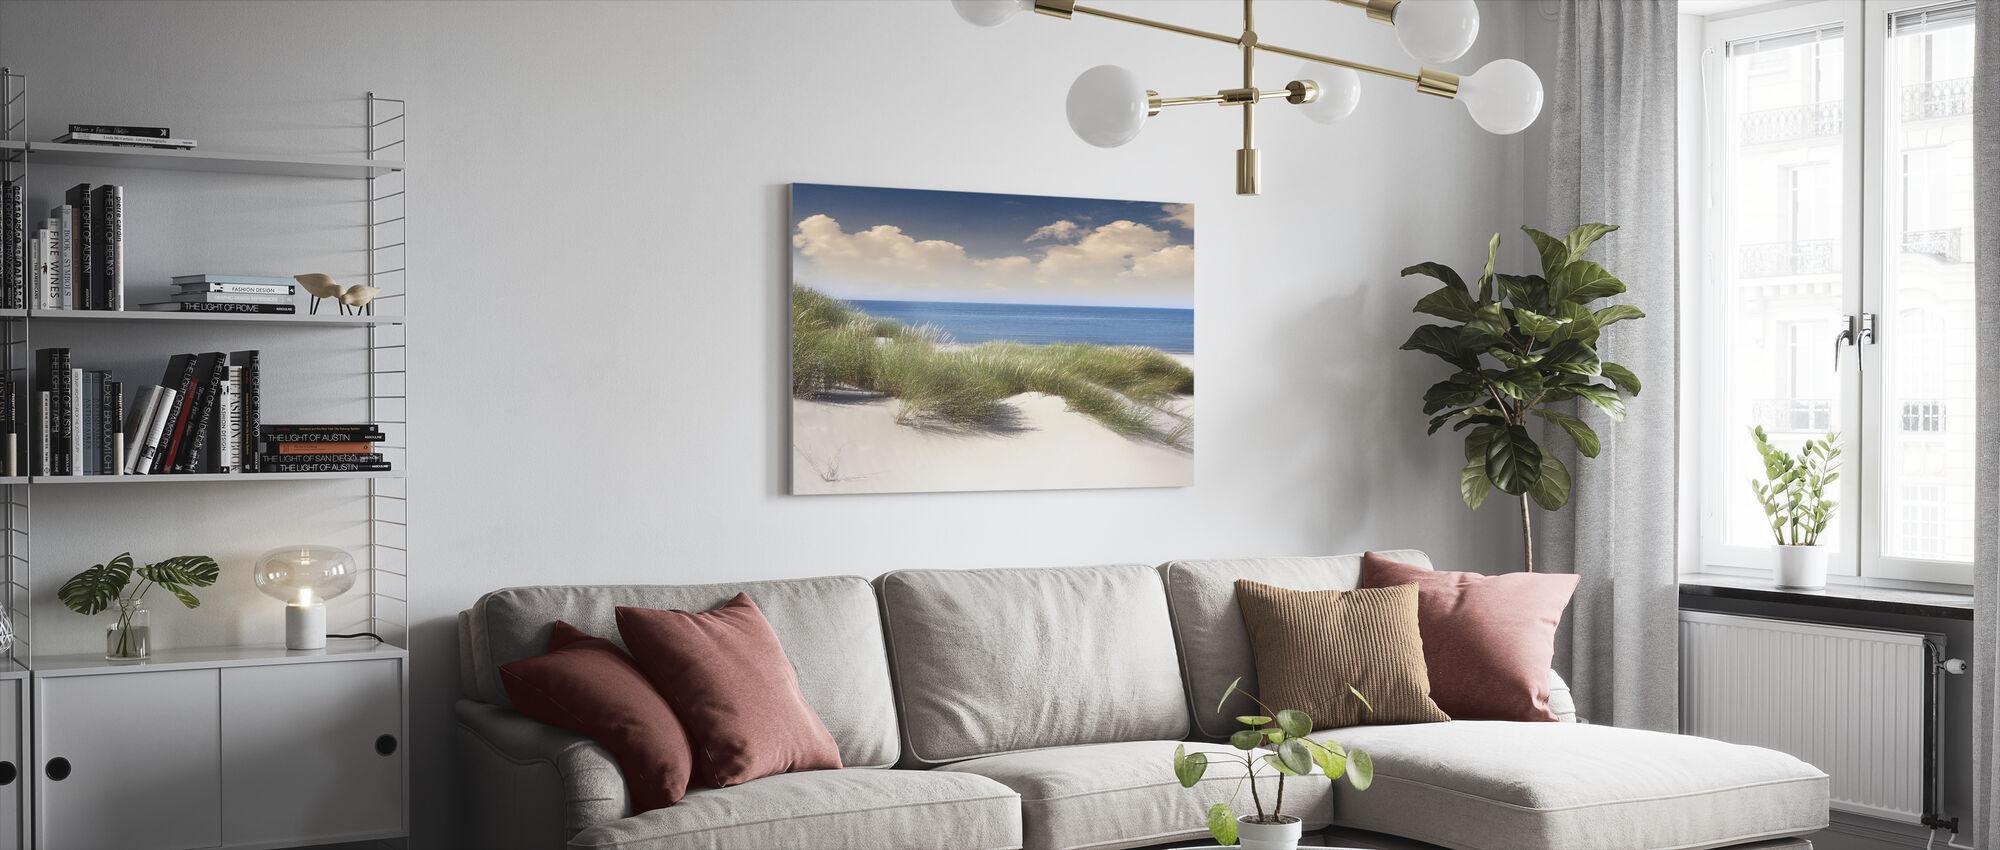 Gresset sanddyner - Lerretsbilde - Stue